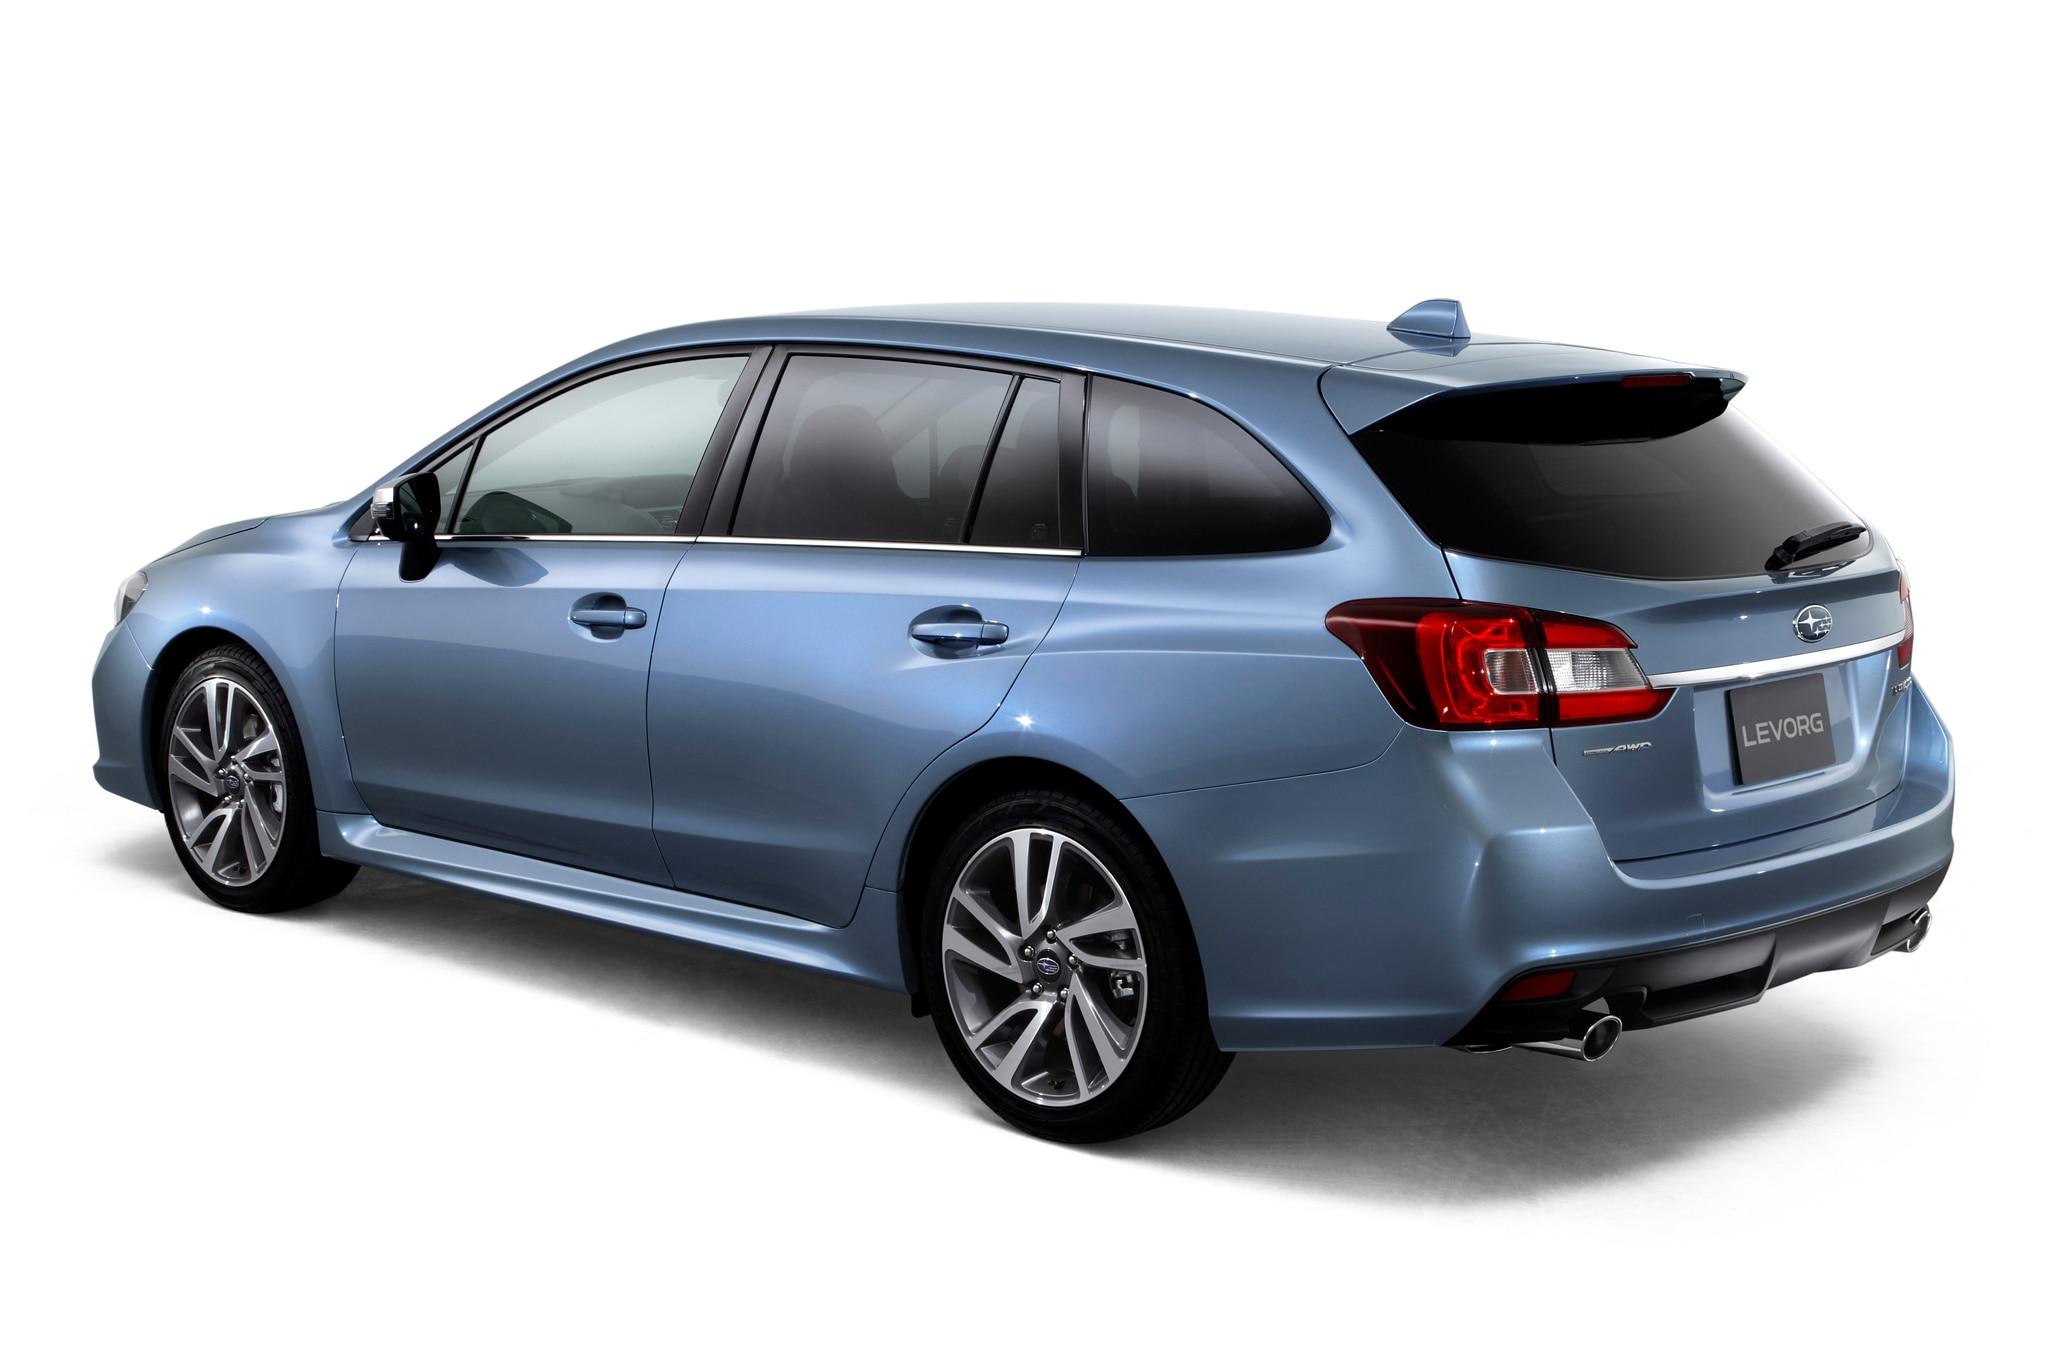 Subaru Levorg Concept Left Rear Angle1